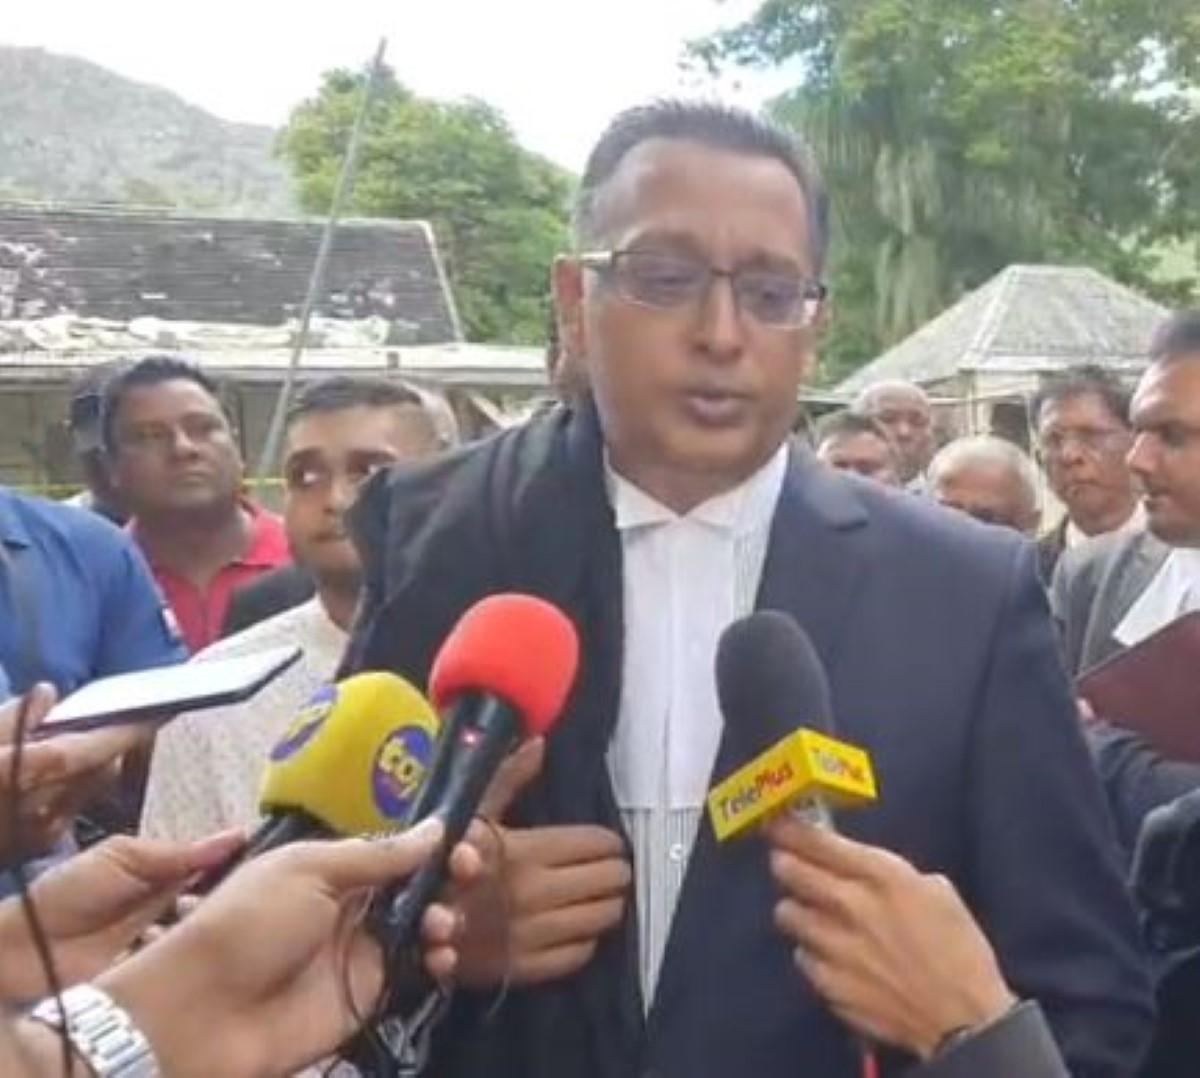 Bhadain logera une Private Prosecution contre Pravind Jugnauth, Leela Devi Dookun-Luchoomun et Yogida Sawmynaden